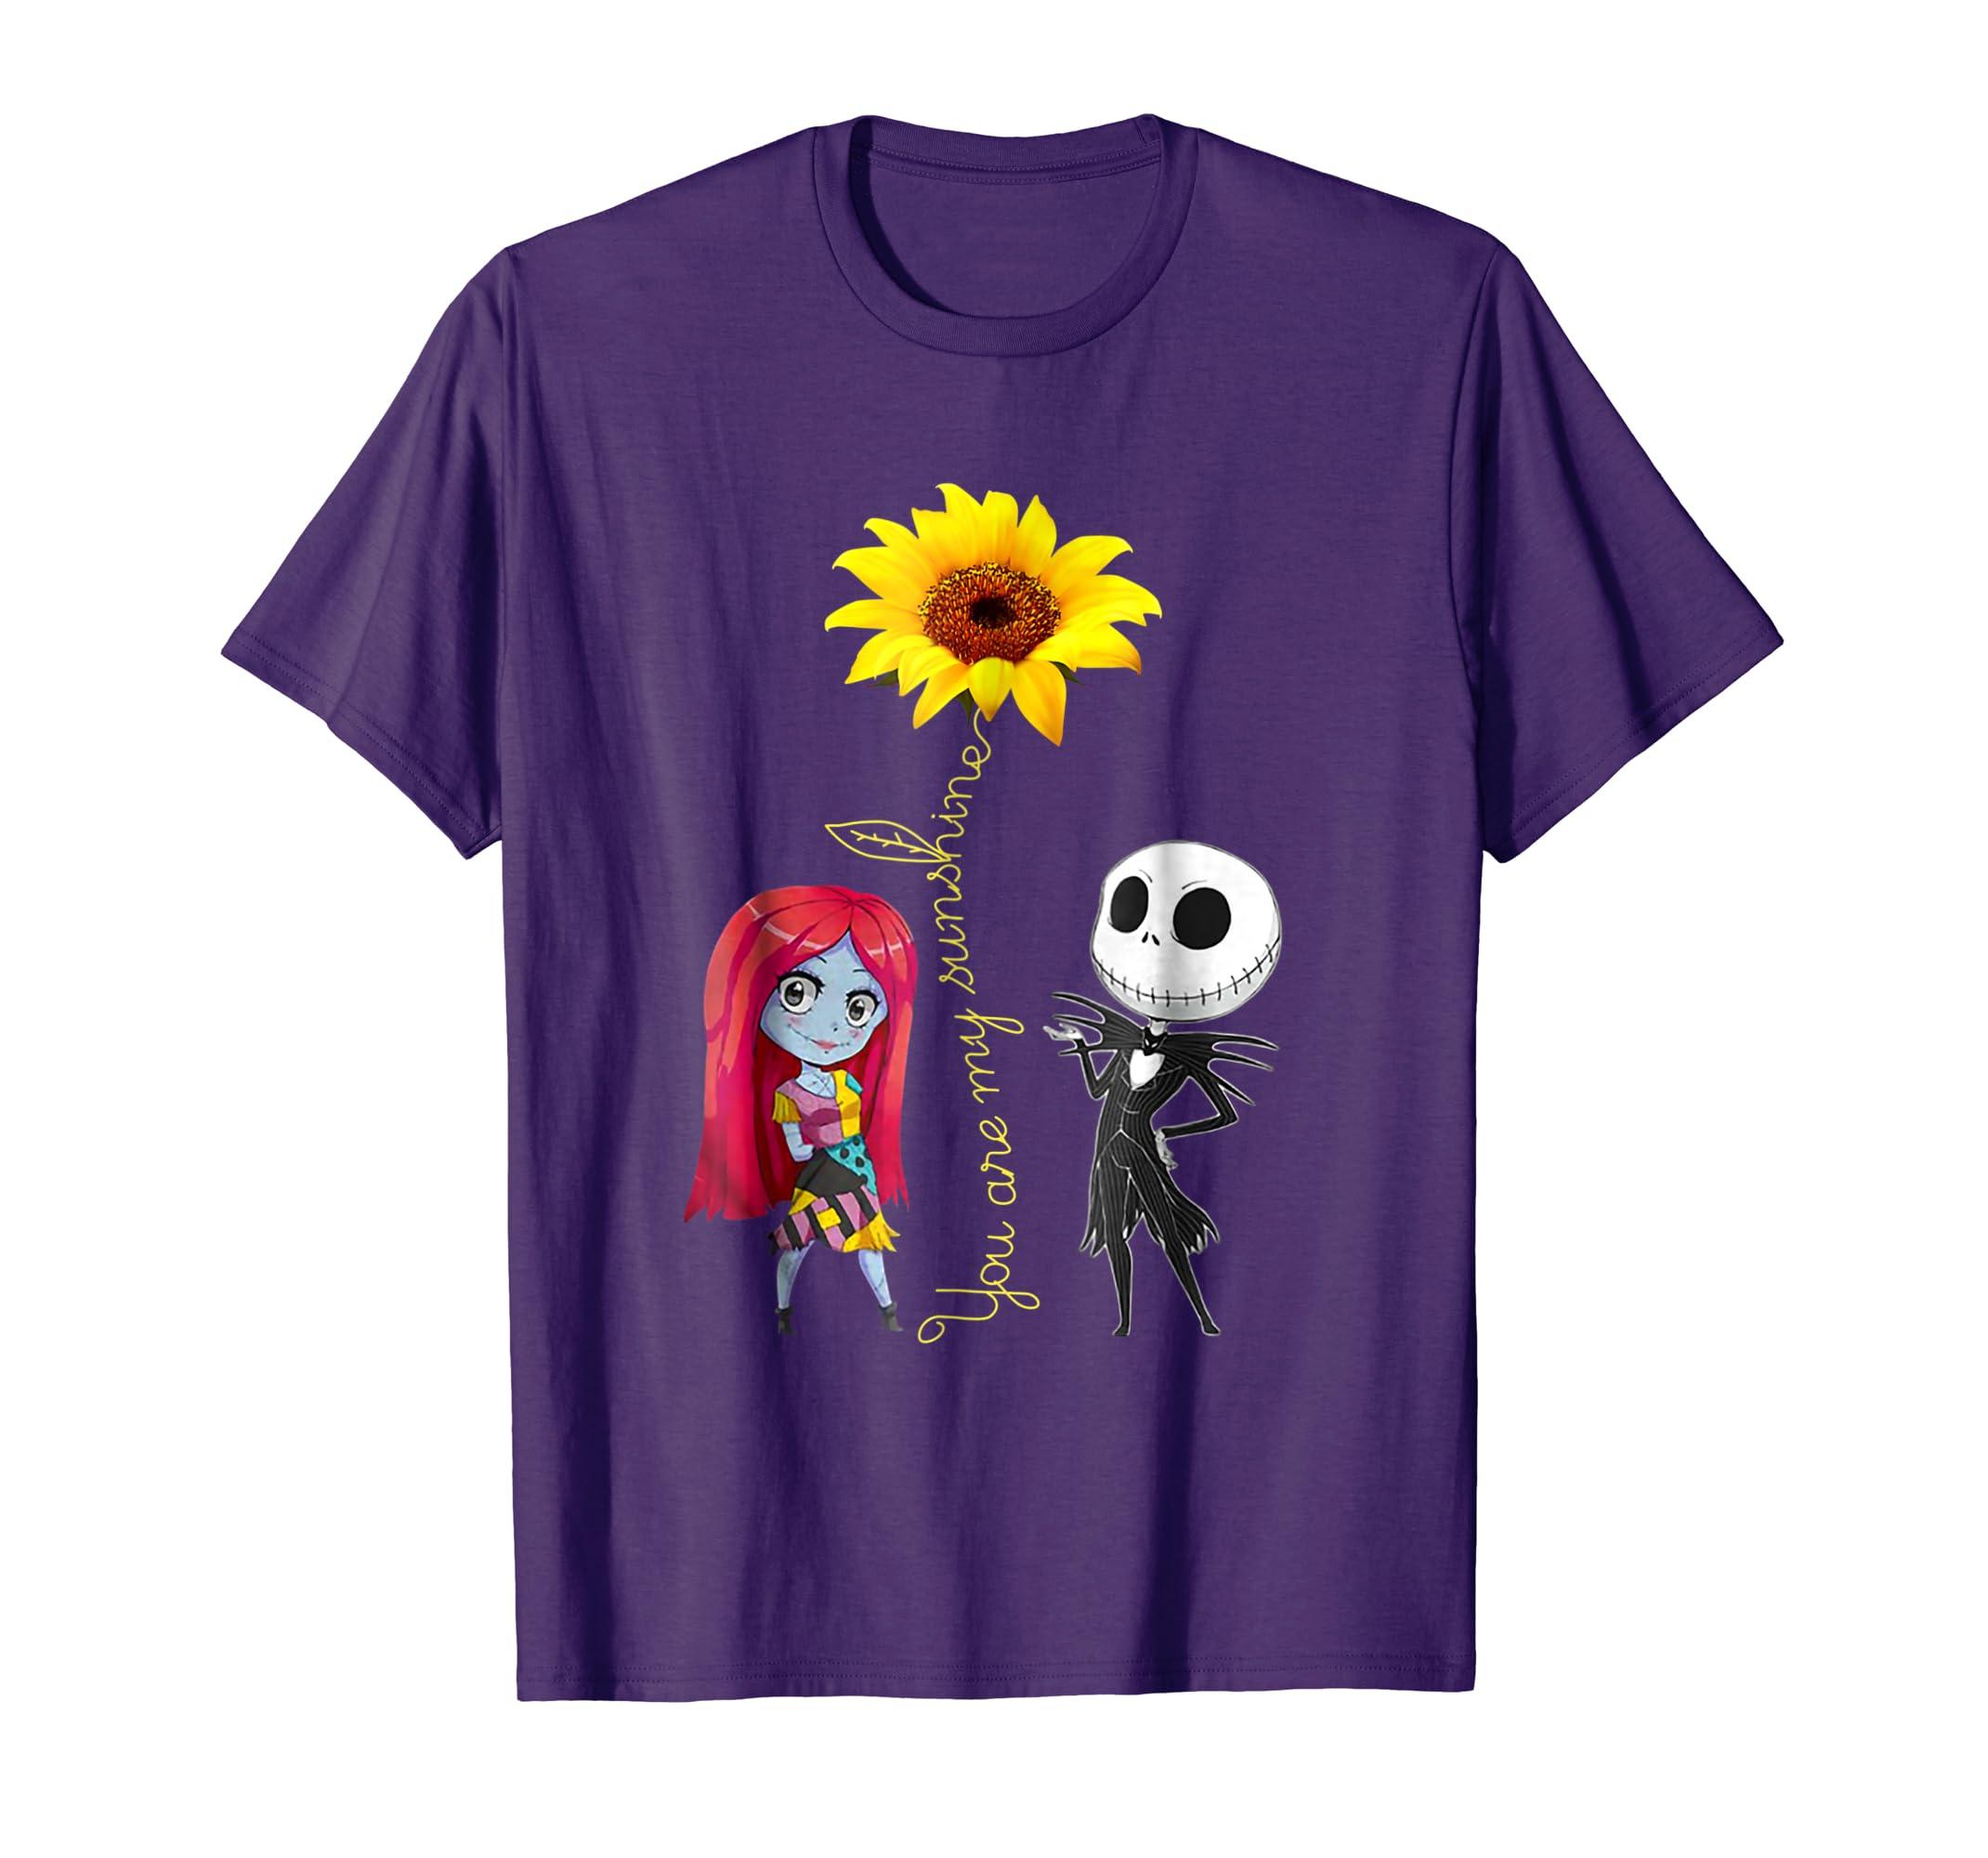 You Are My Sunshine Sunflower Jack Skellington Sally Shirt-Colonhue